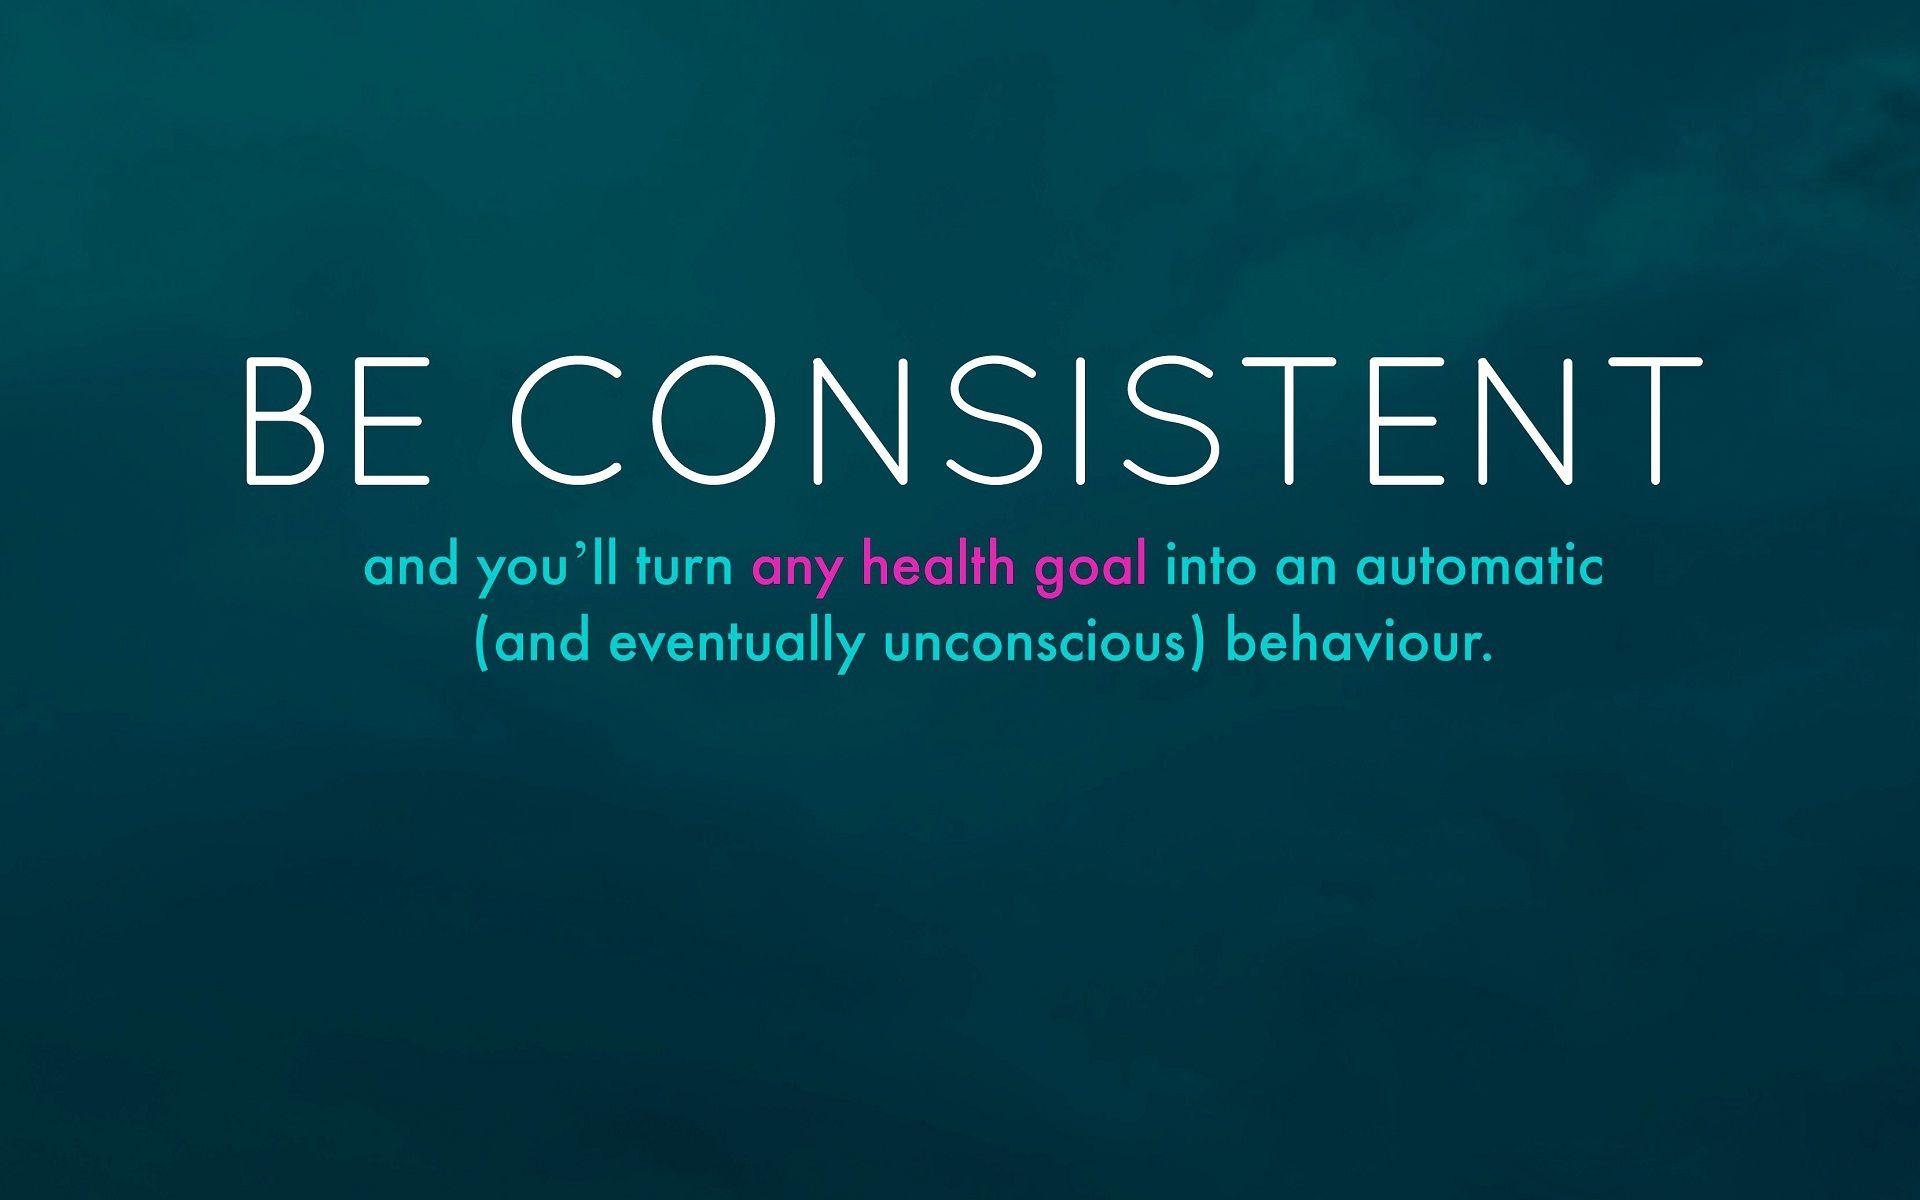 Pinterest Positive Inspirational Quotes Desktop Backgrounds